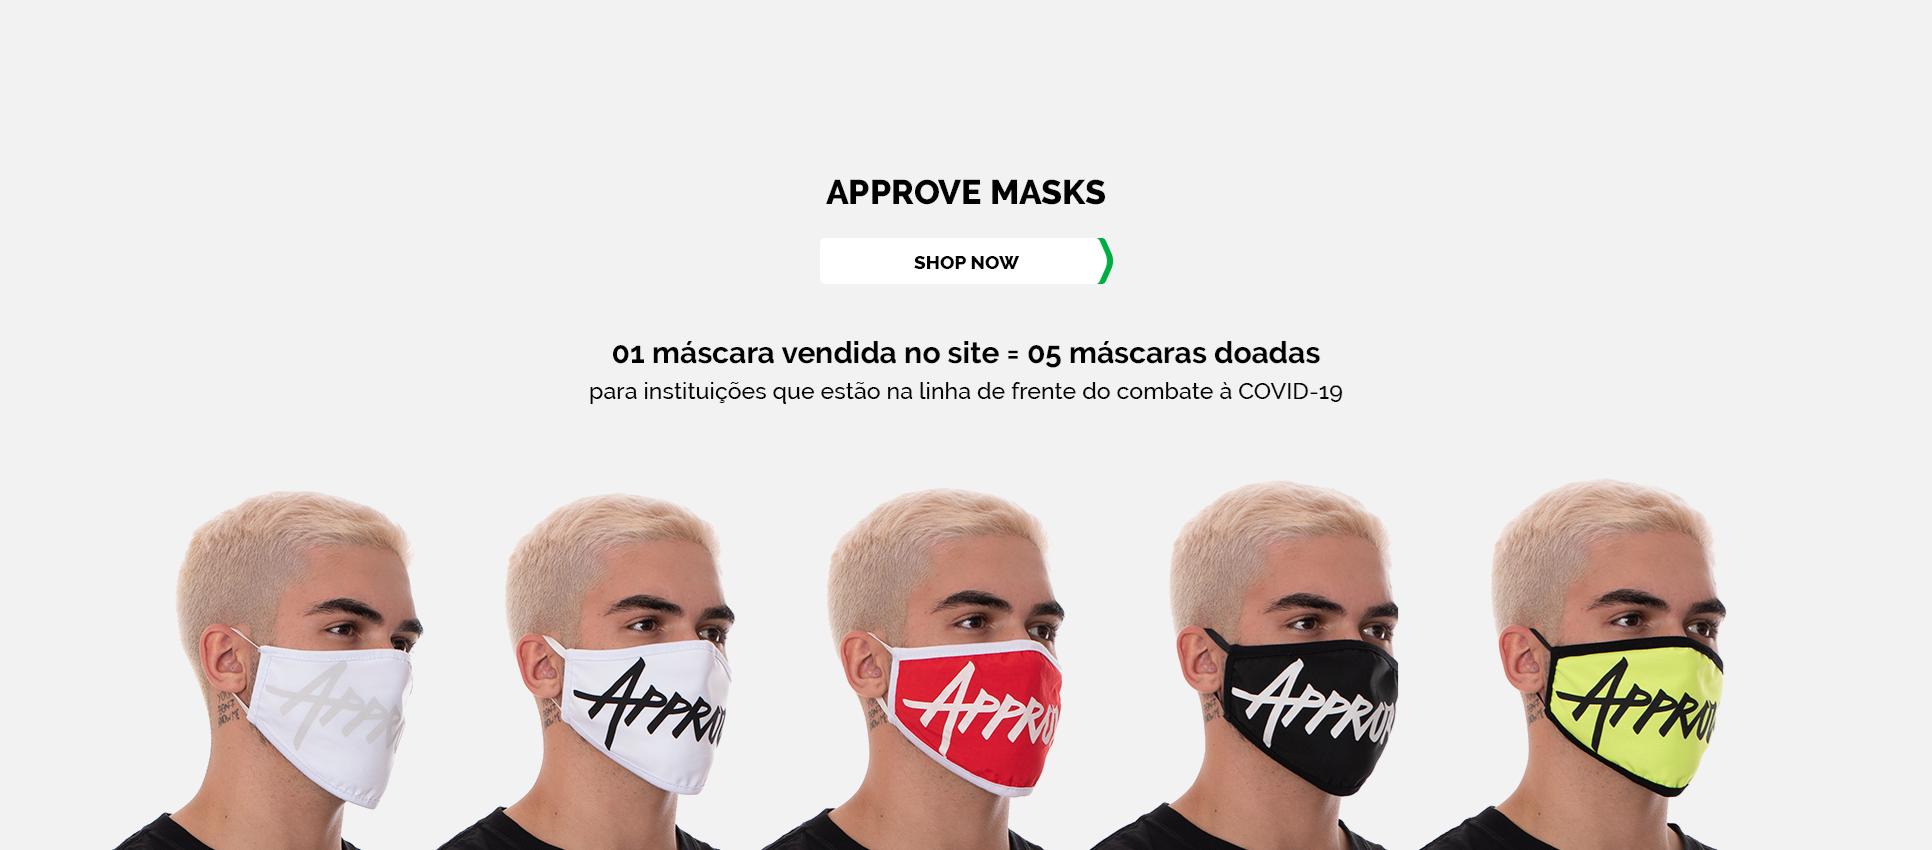 Máscaras - Just Approve